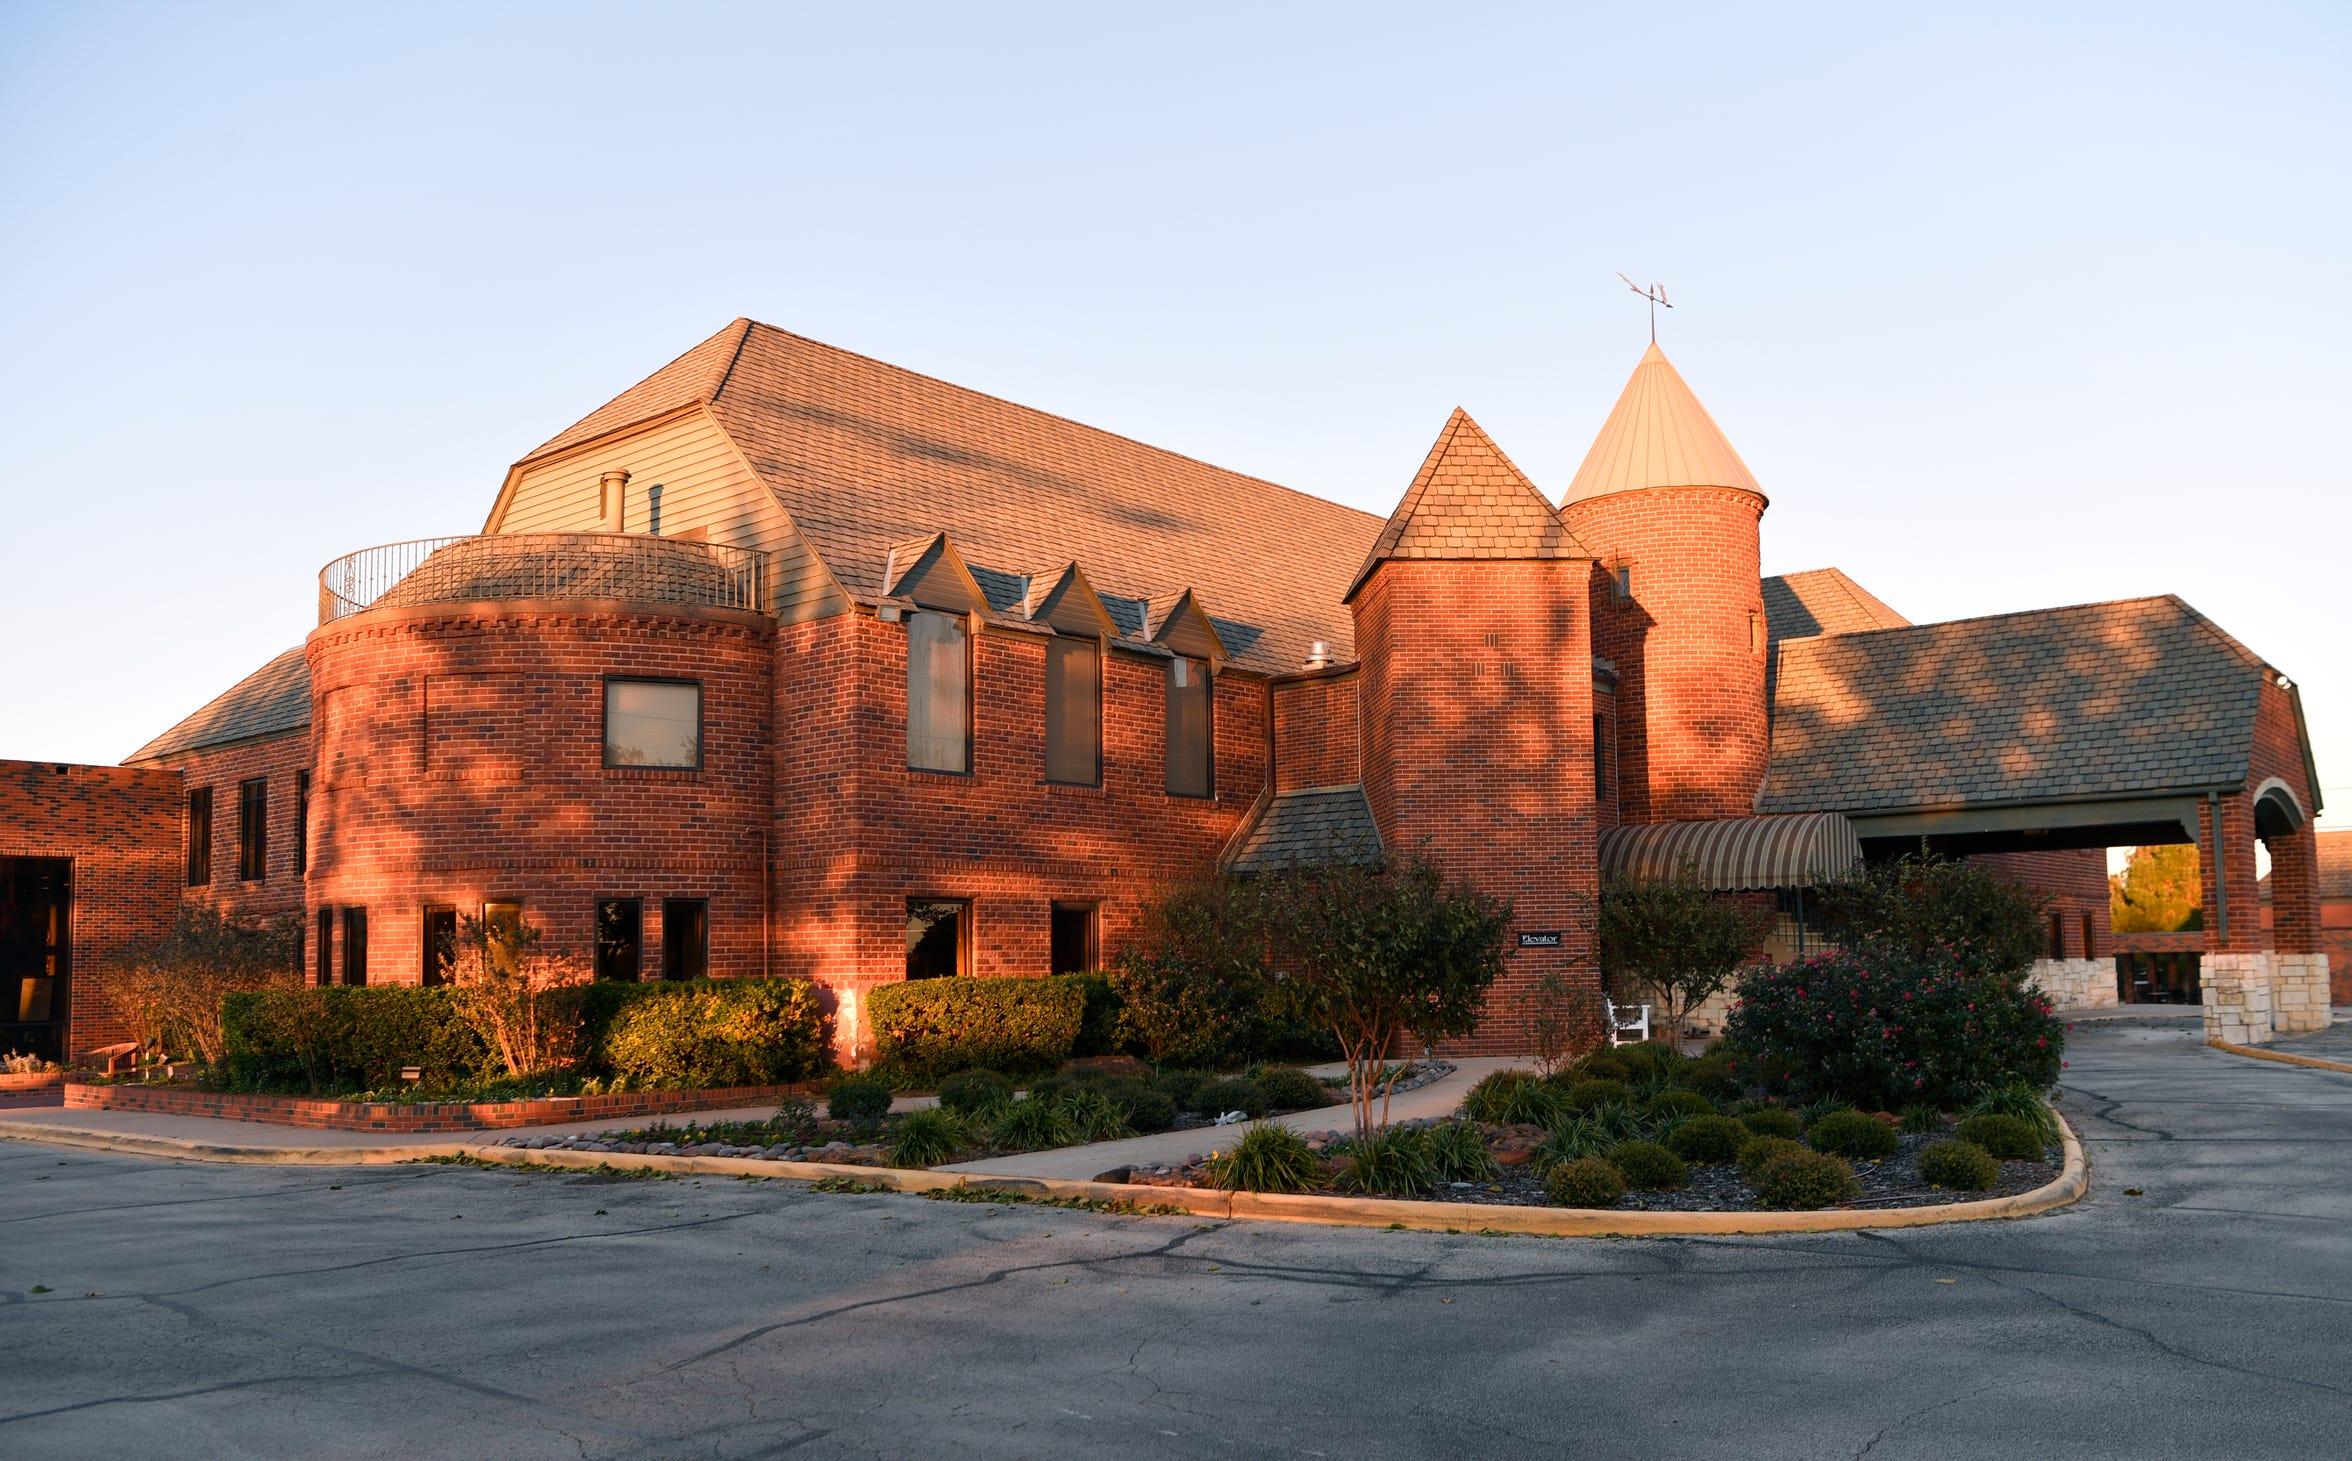 The Abilene Country Club, designed by Abilene architect David Castle.